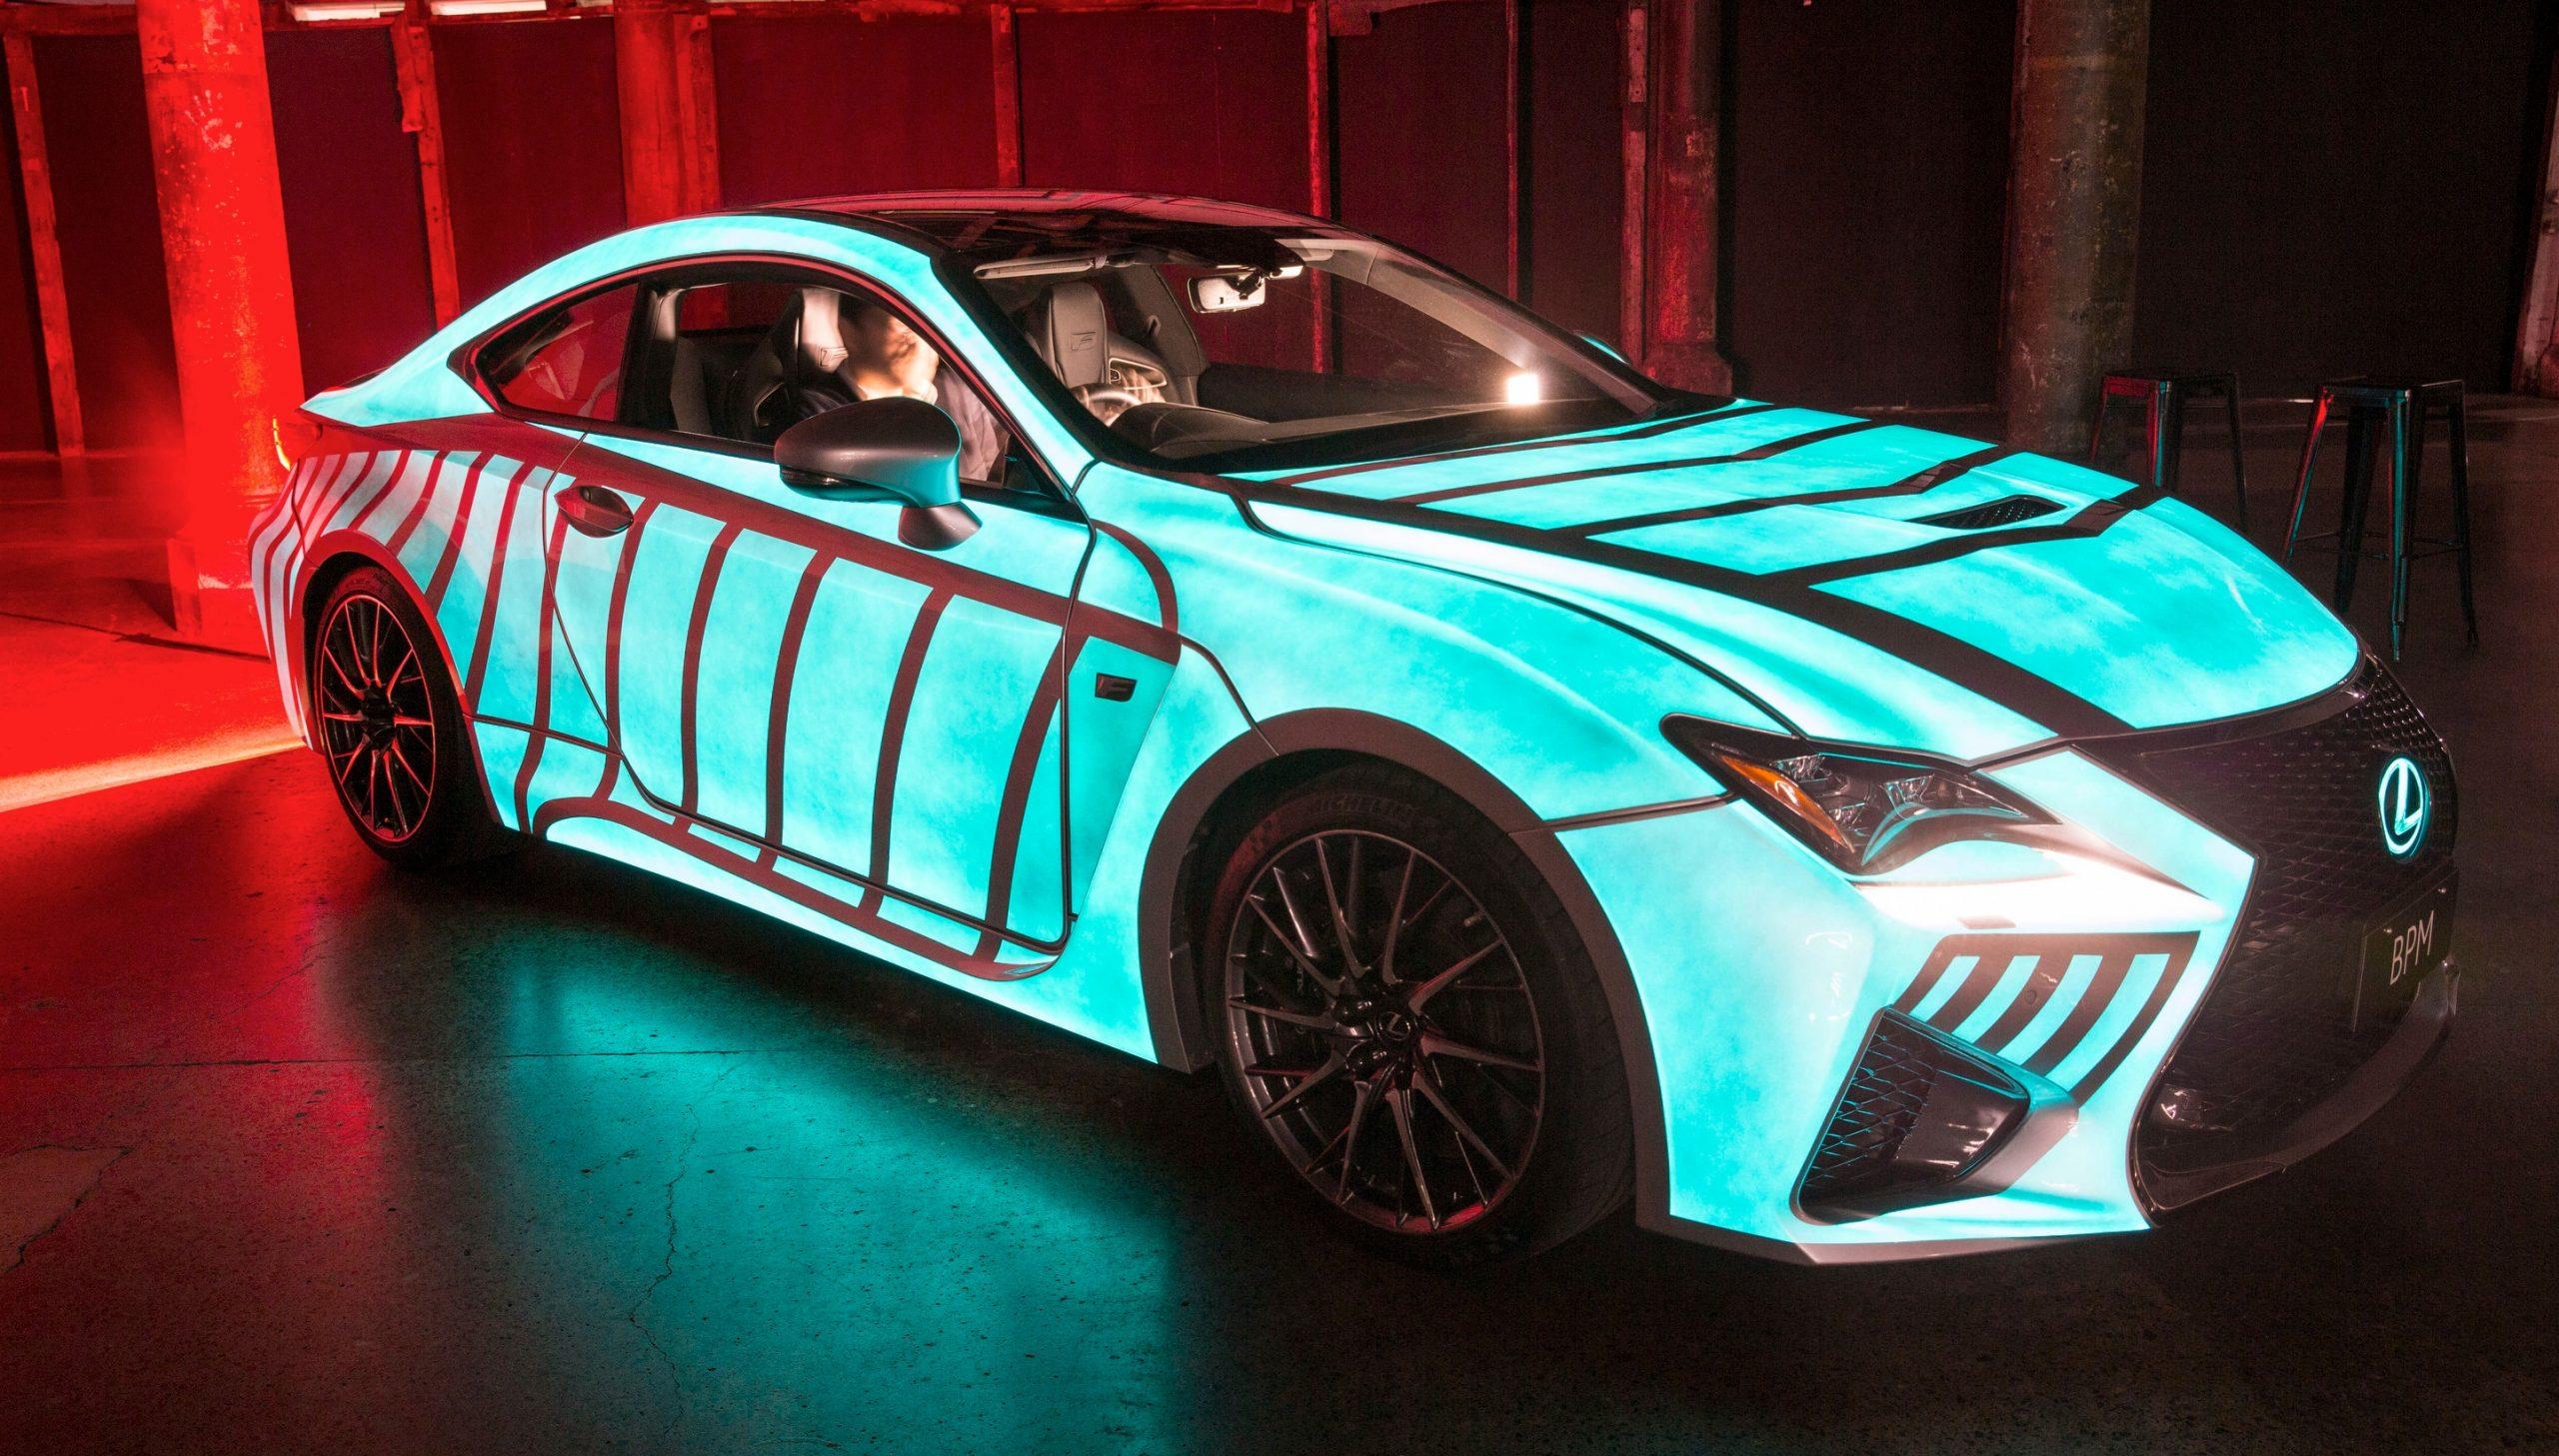 Светодиодная краска на автомобиле